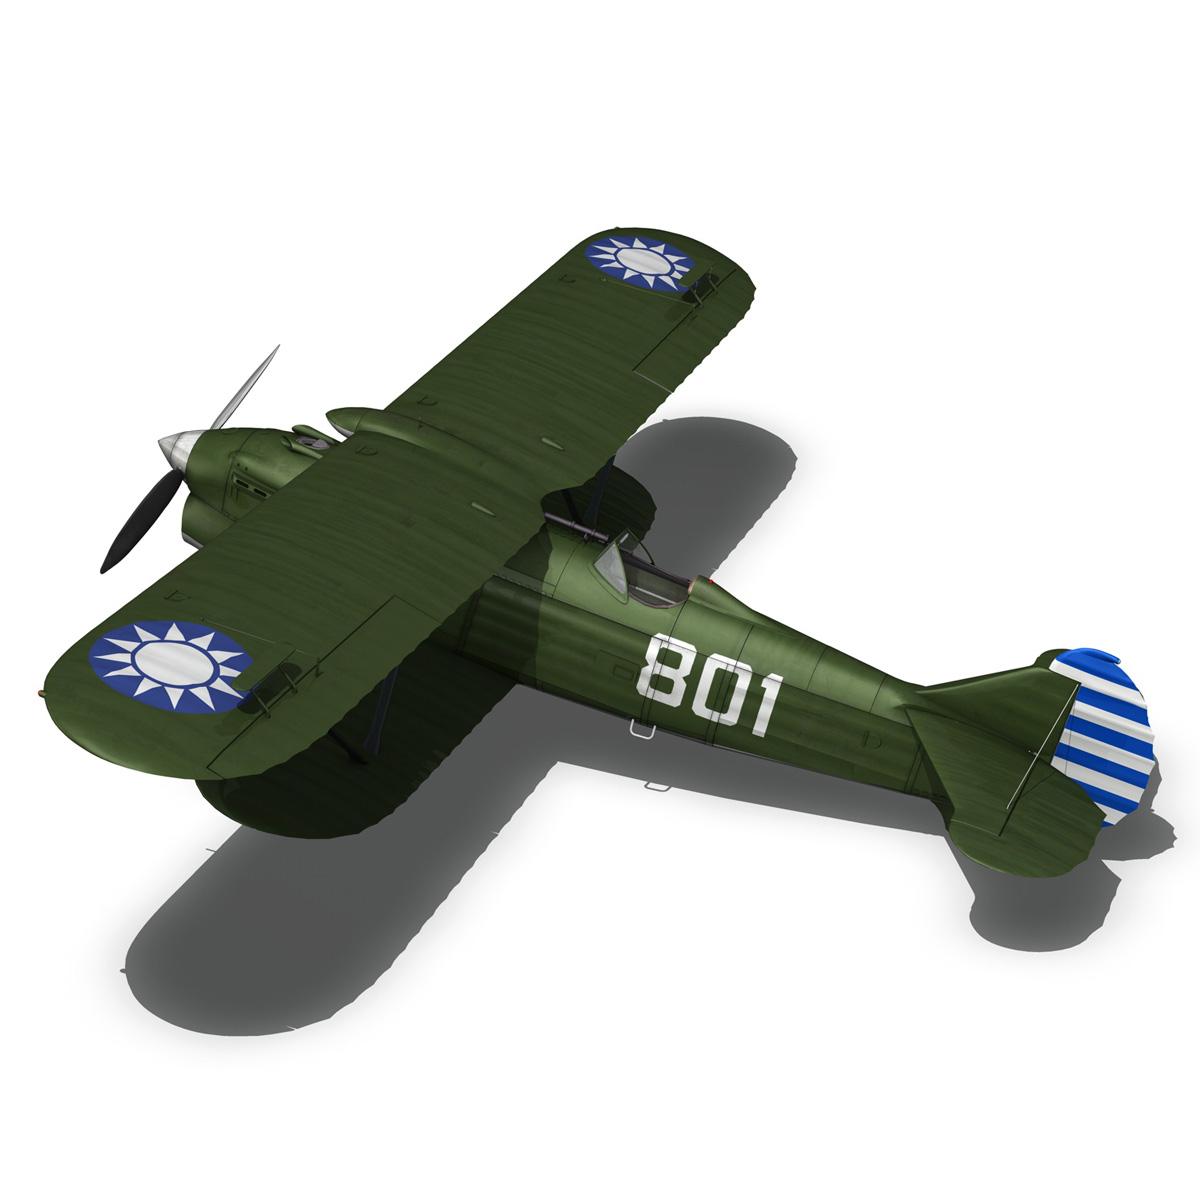 fiat cr.32 – chinese nationalist air force 3d model fbx c4d lwo obj 272636